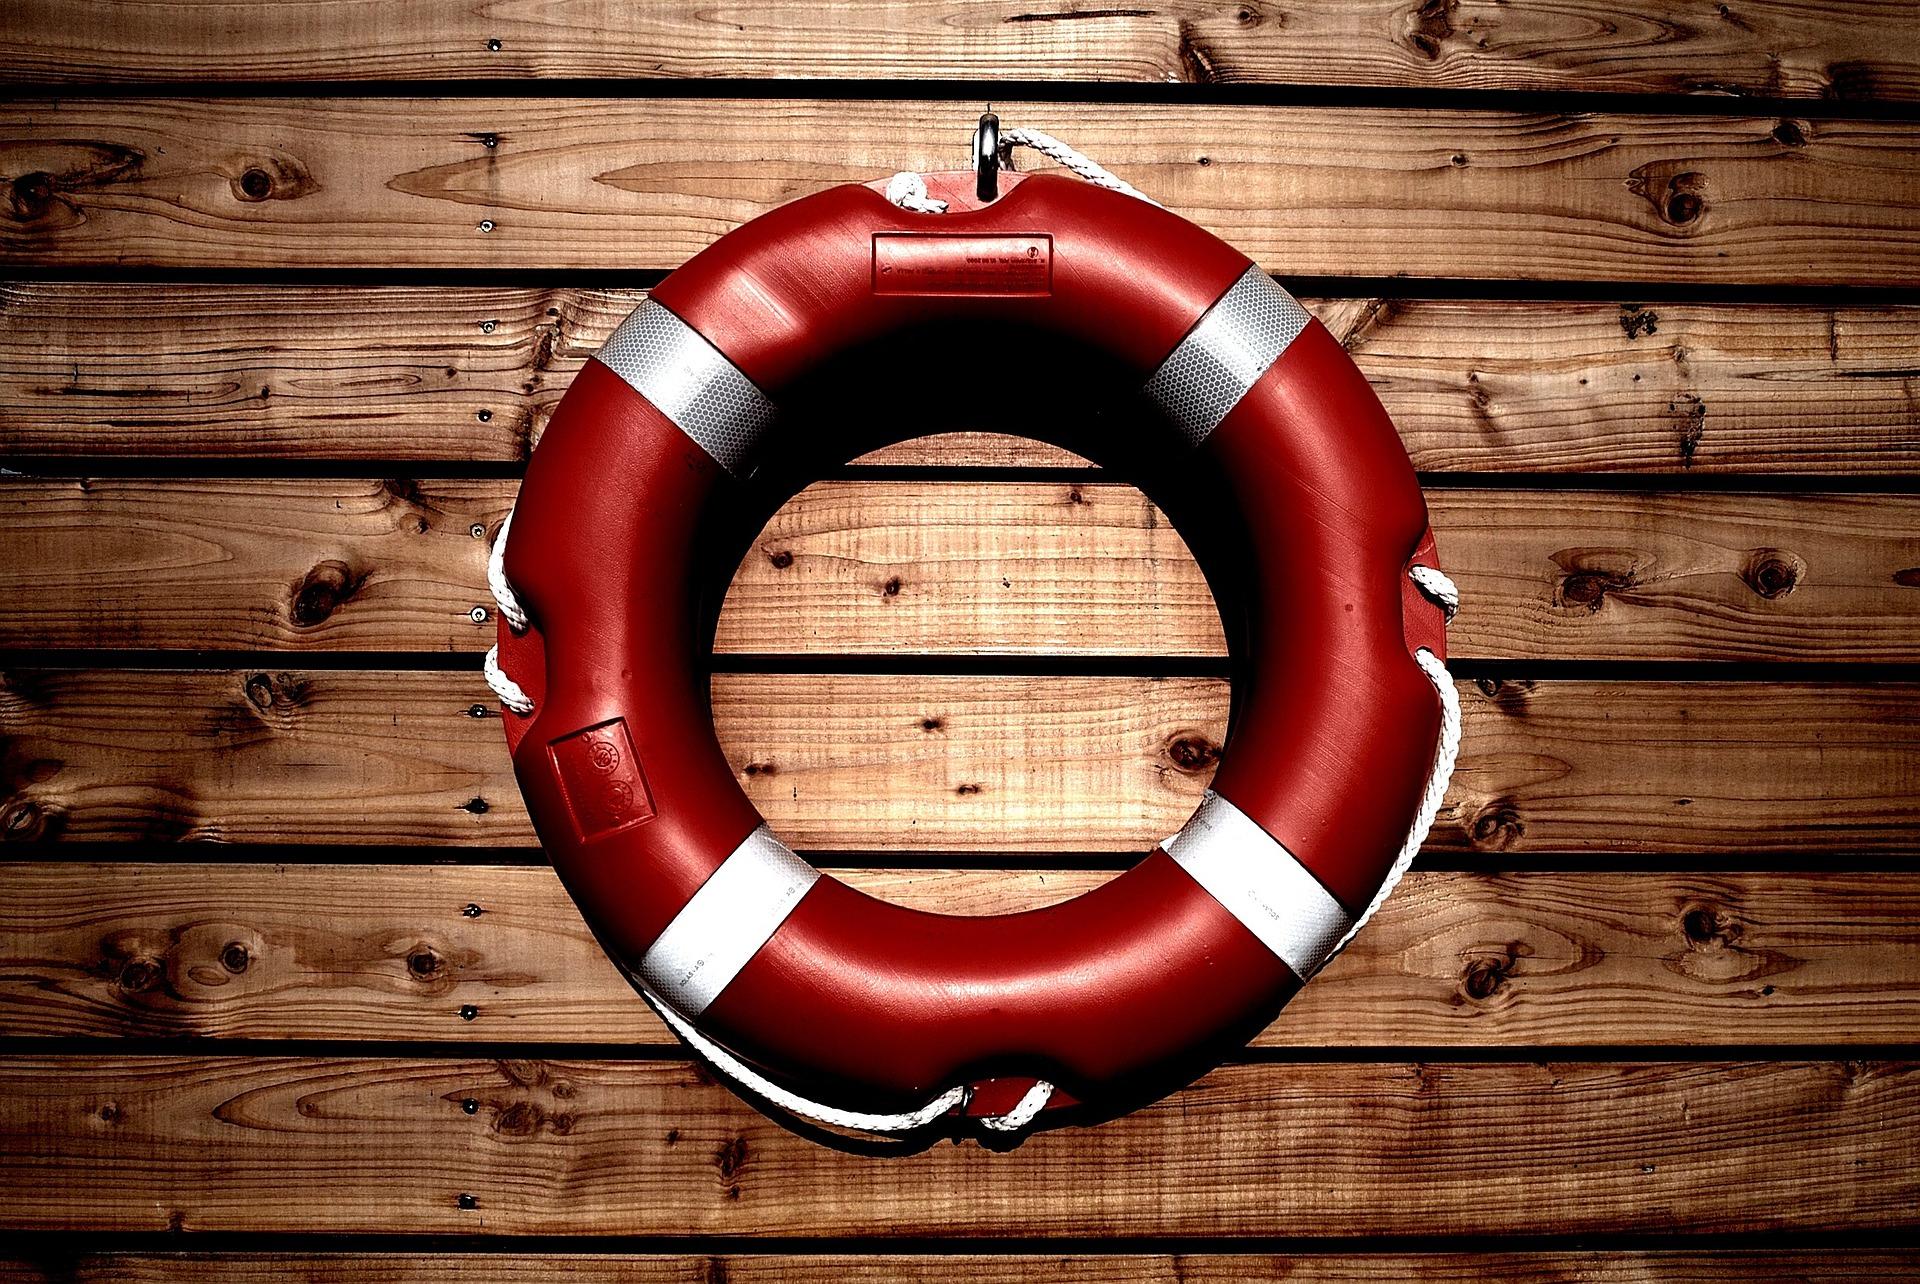 lifesaver-933560_1920